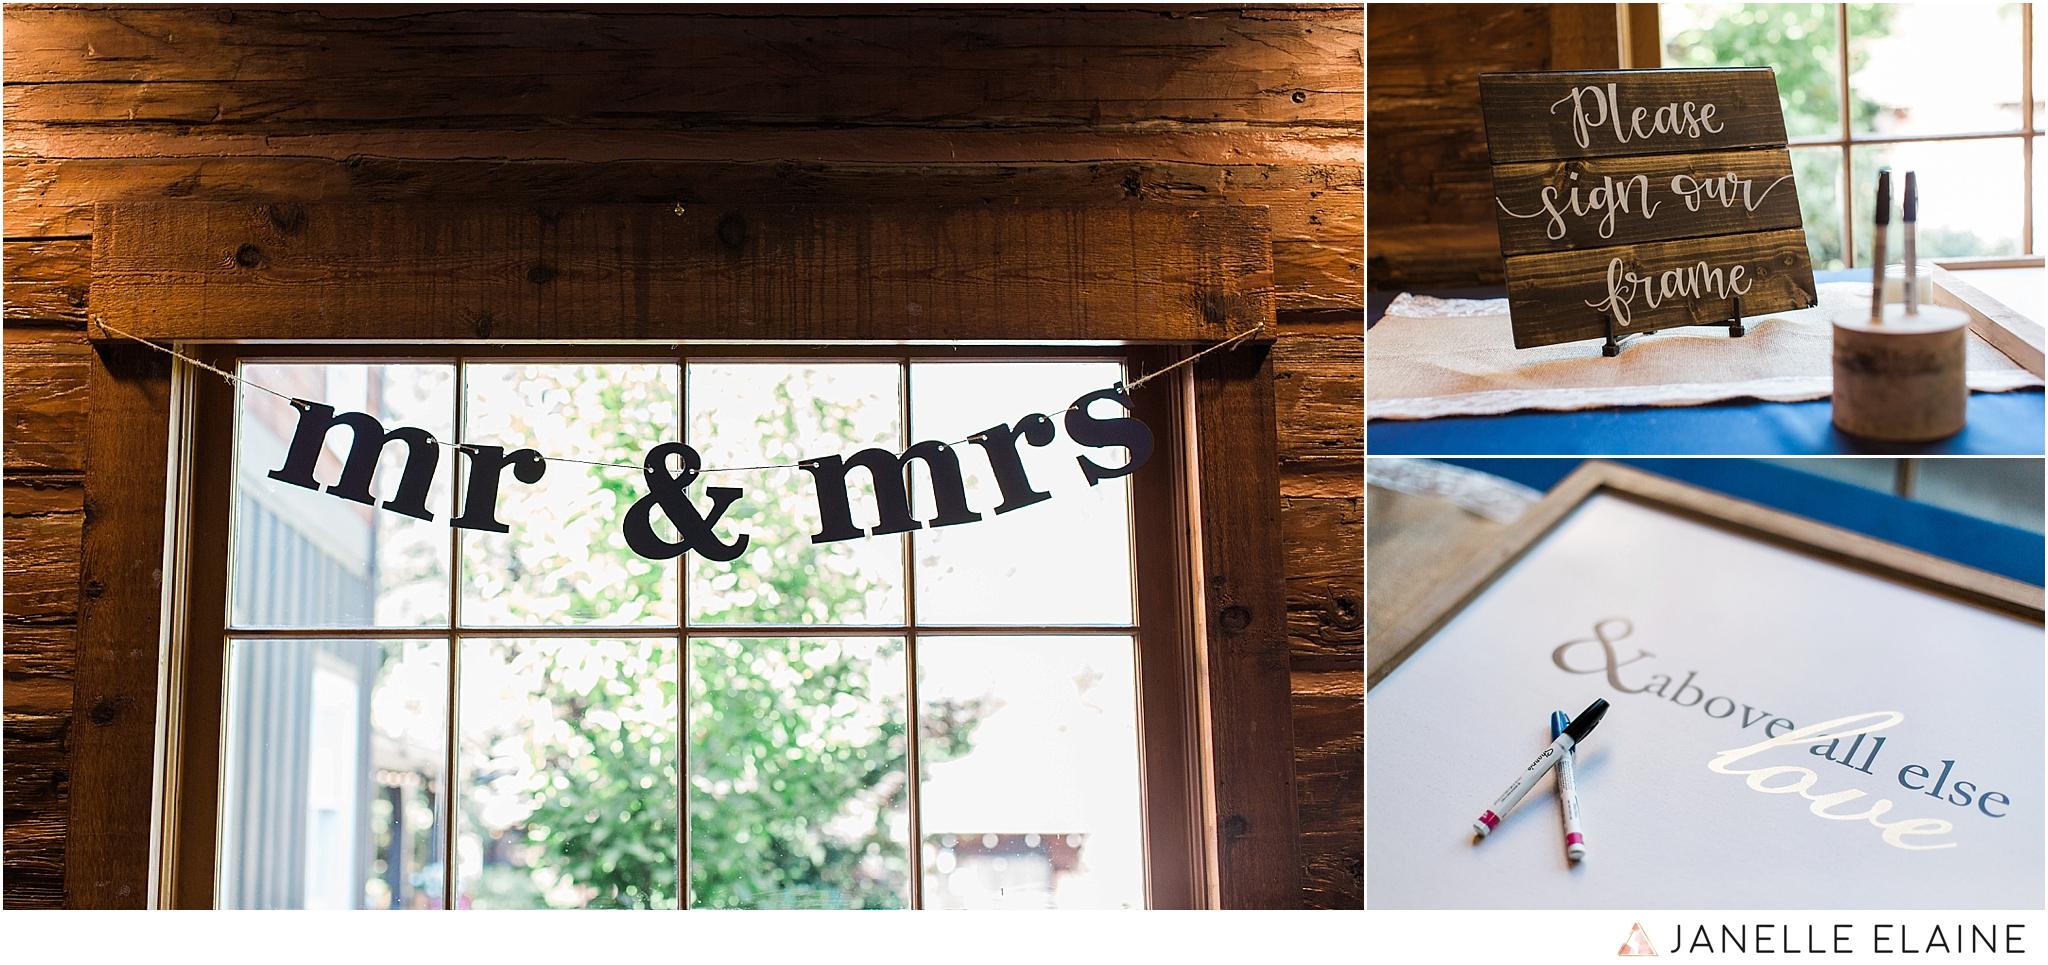 janelle elaine photography-professional wedding photographer-seattle-bellevue-robinswood house-27.jpg